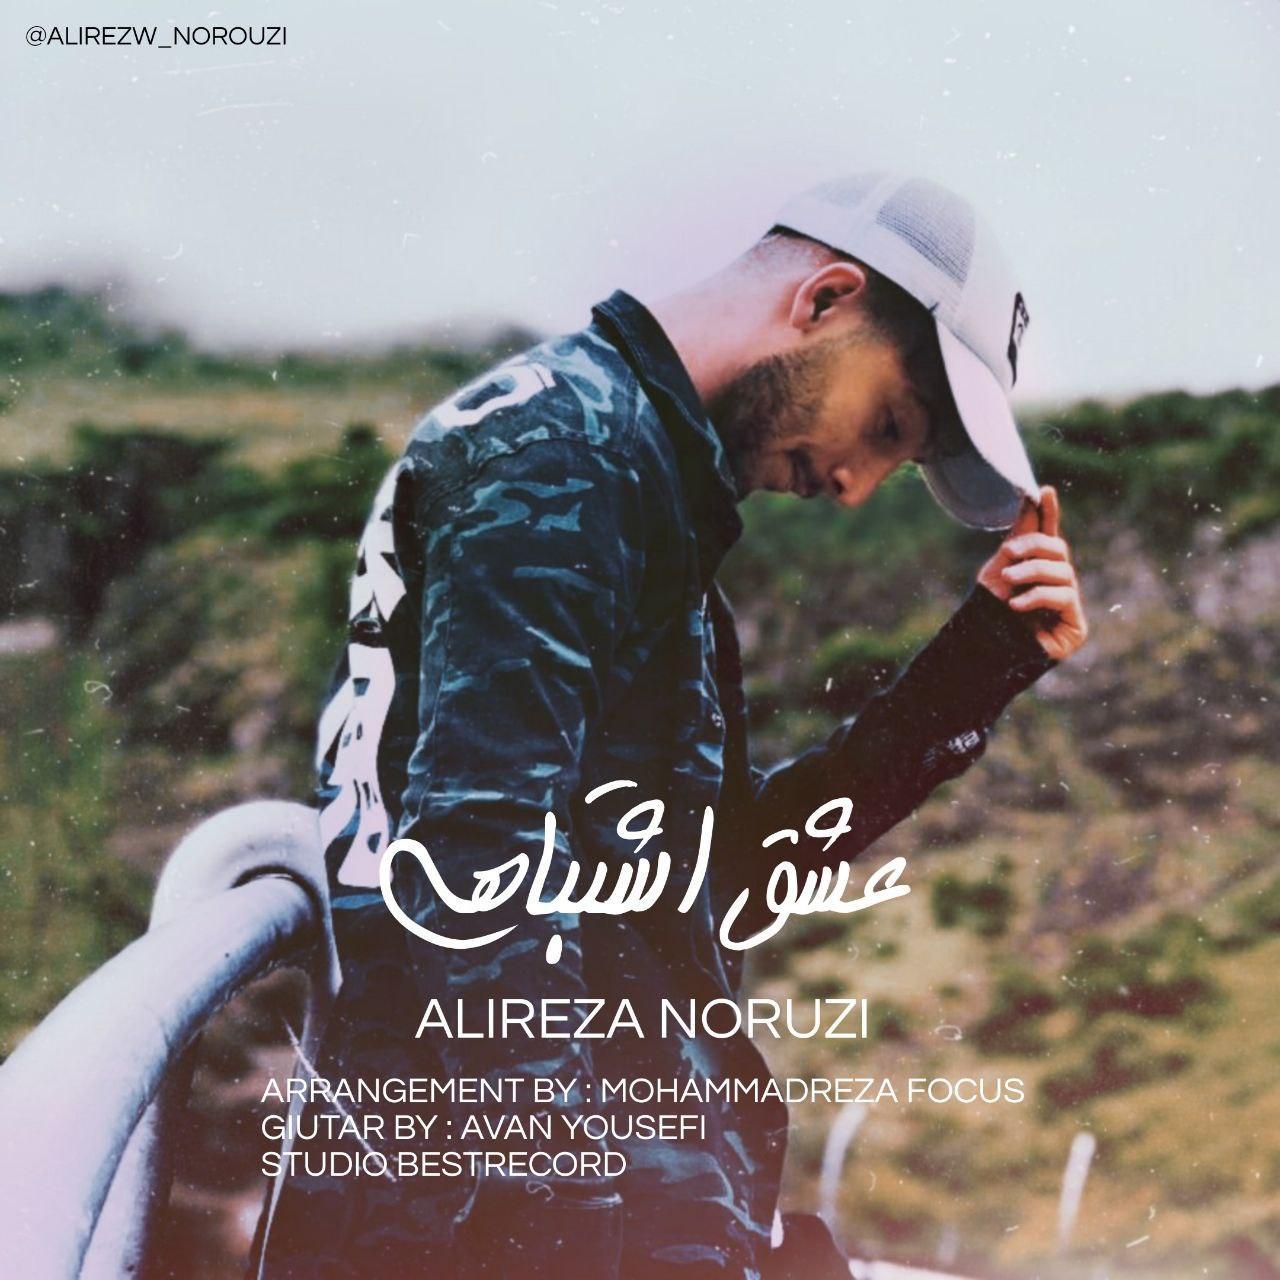 Alireza Noruzi – Eshghe Eshtebahi